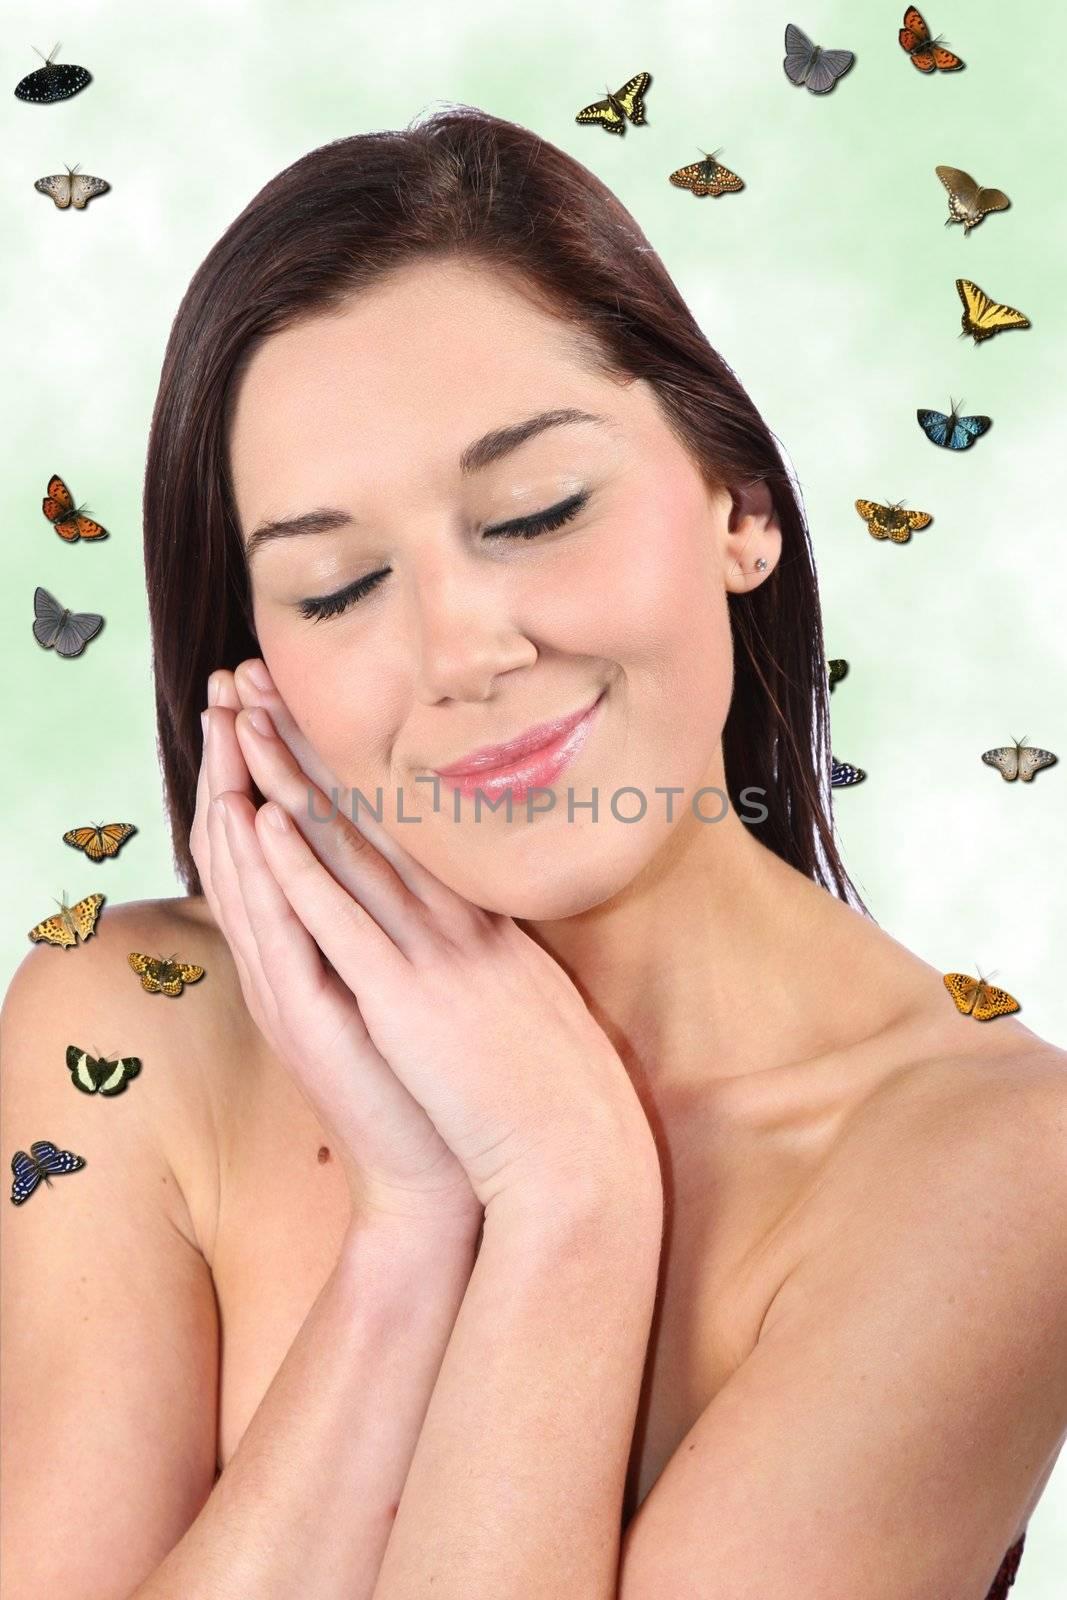 Beautiful brunette woman dreaming of spring season